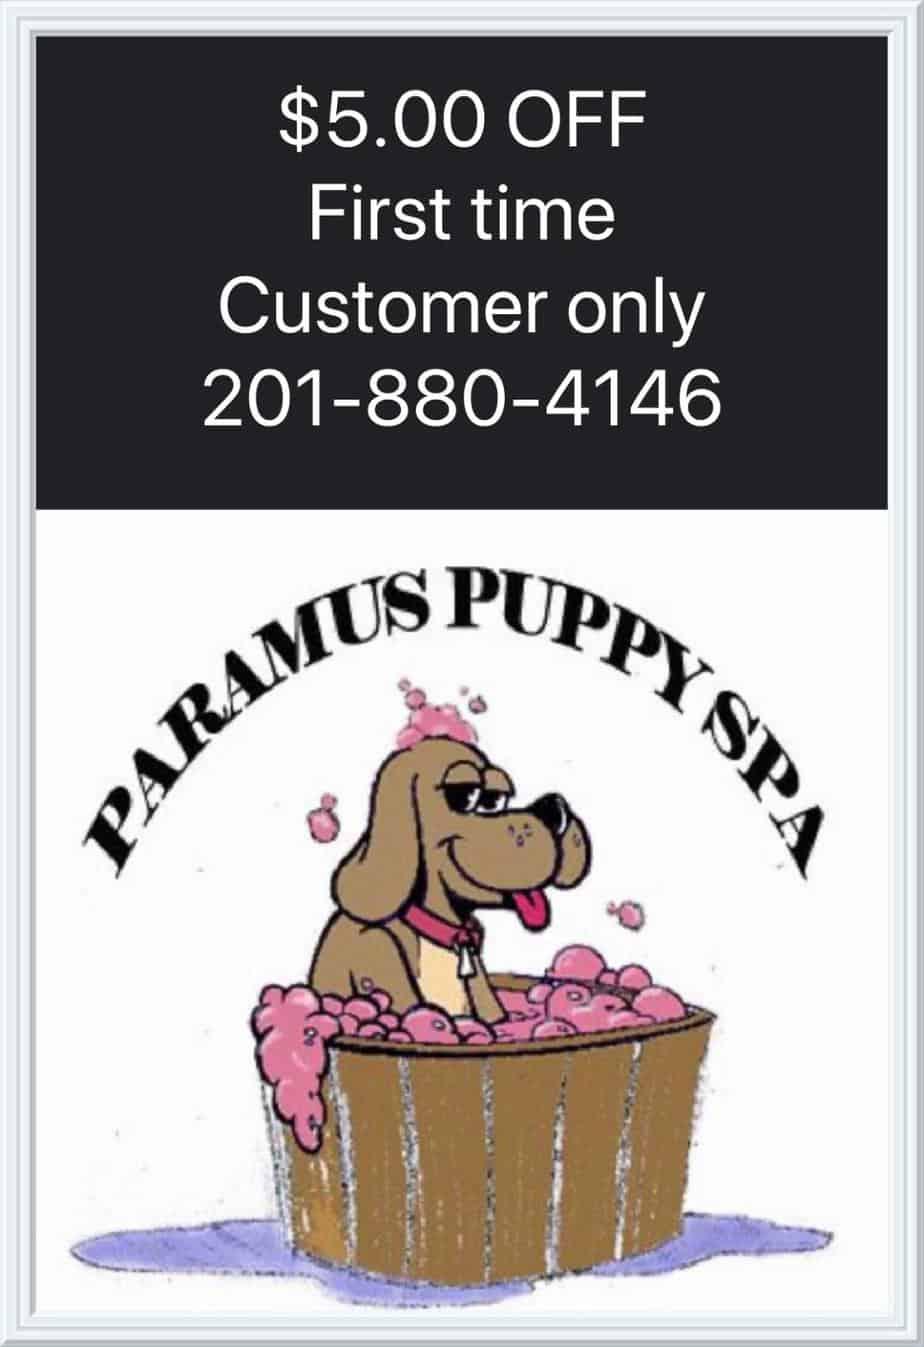 paramuspuppyspa-coupon2019